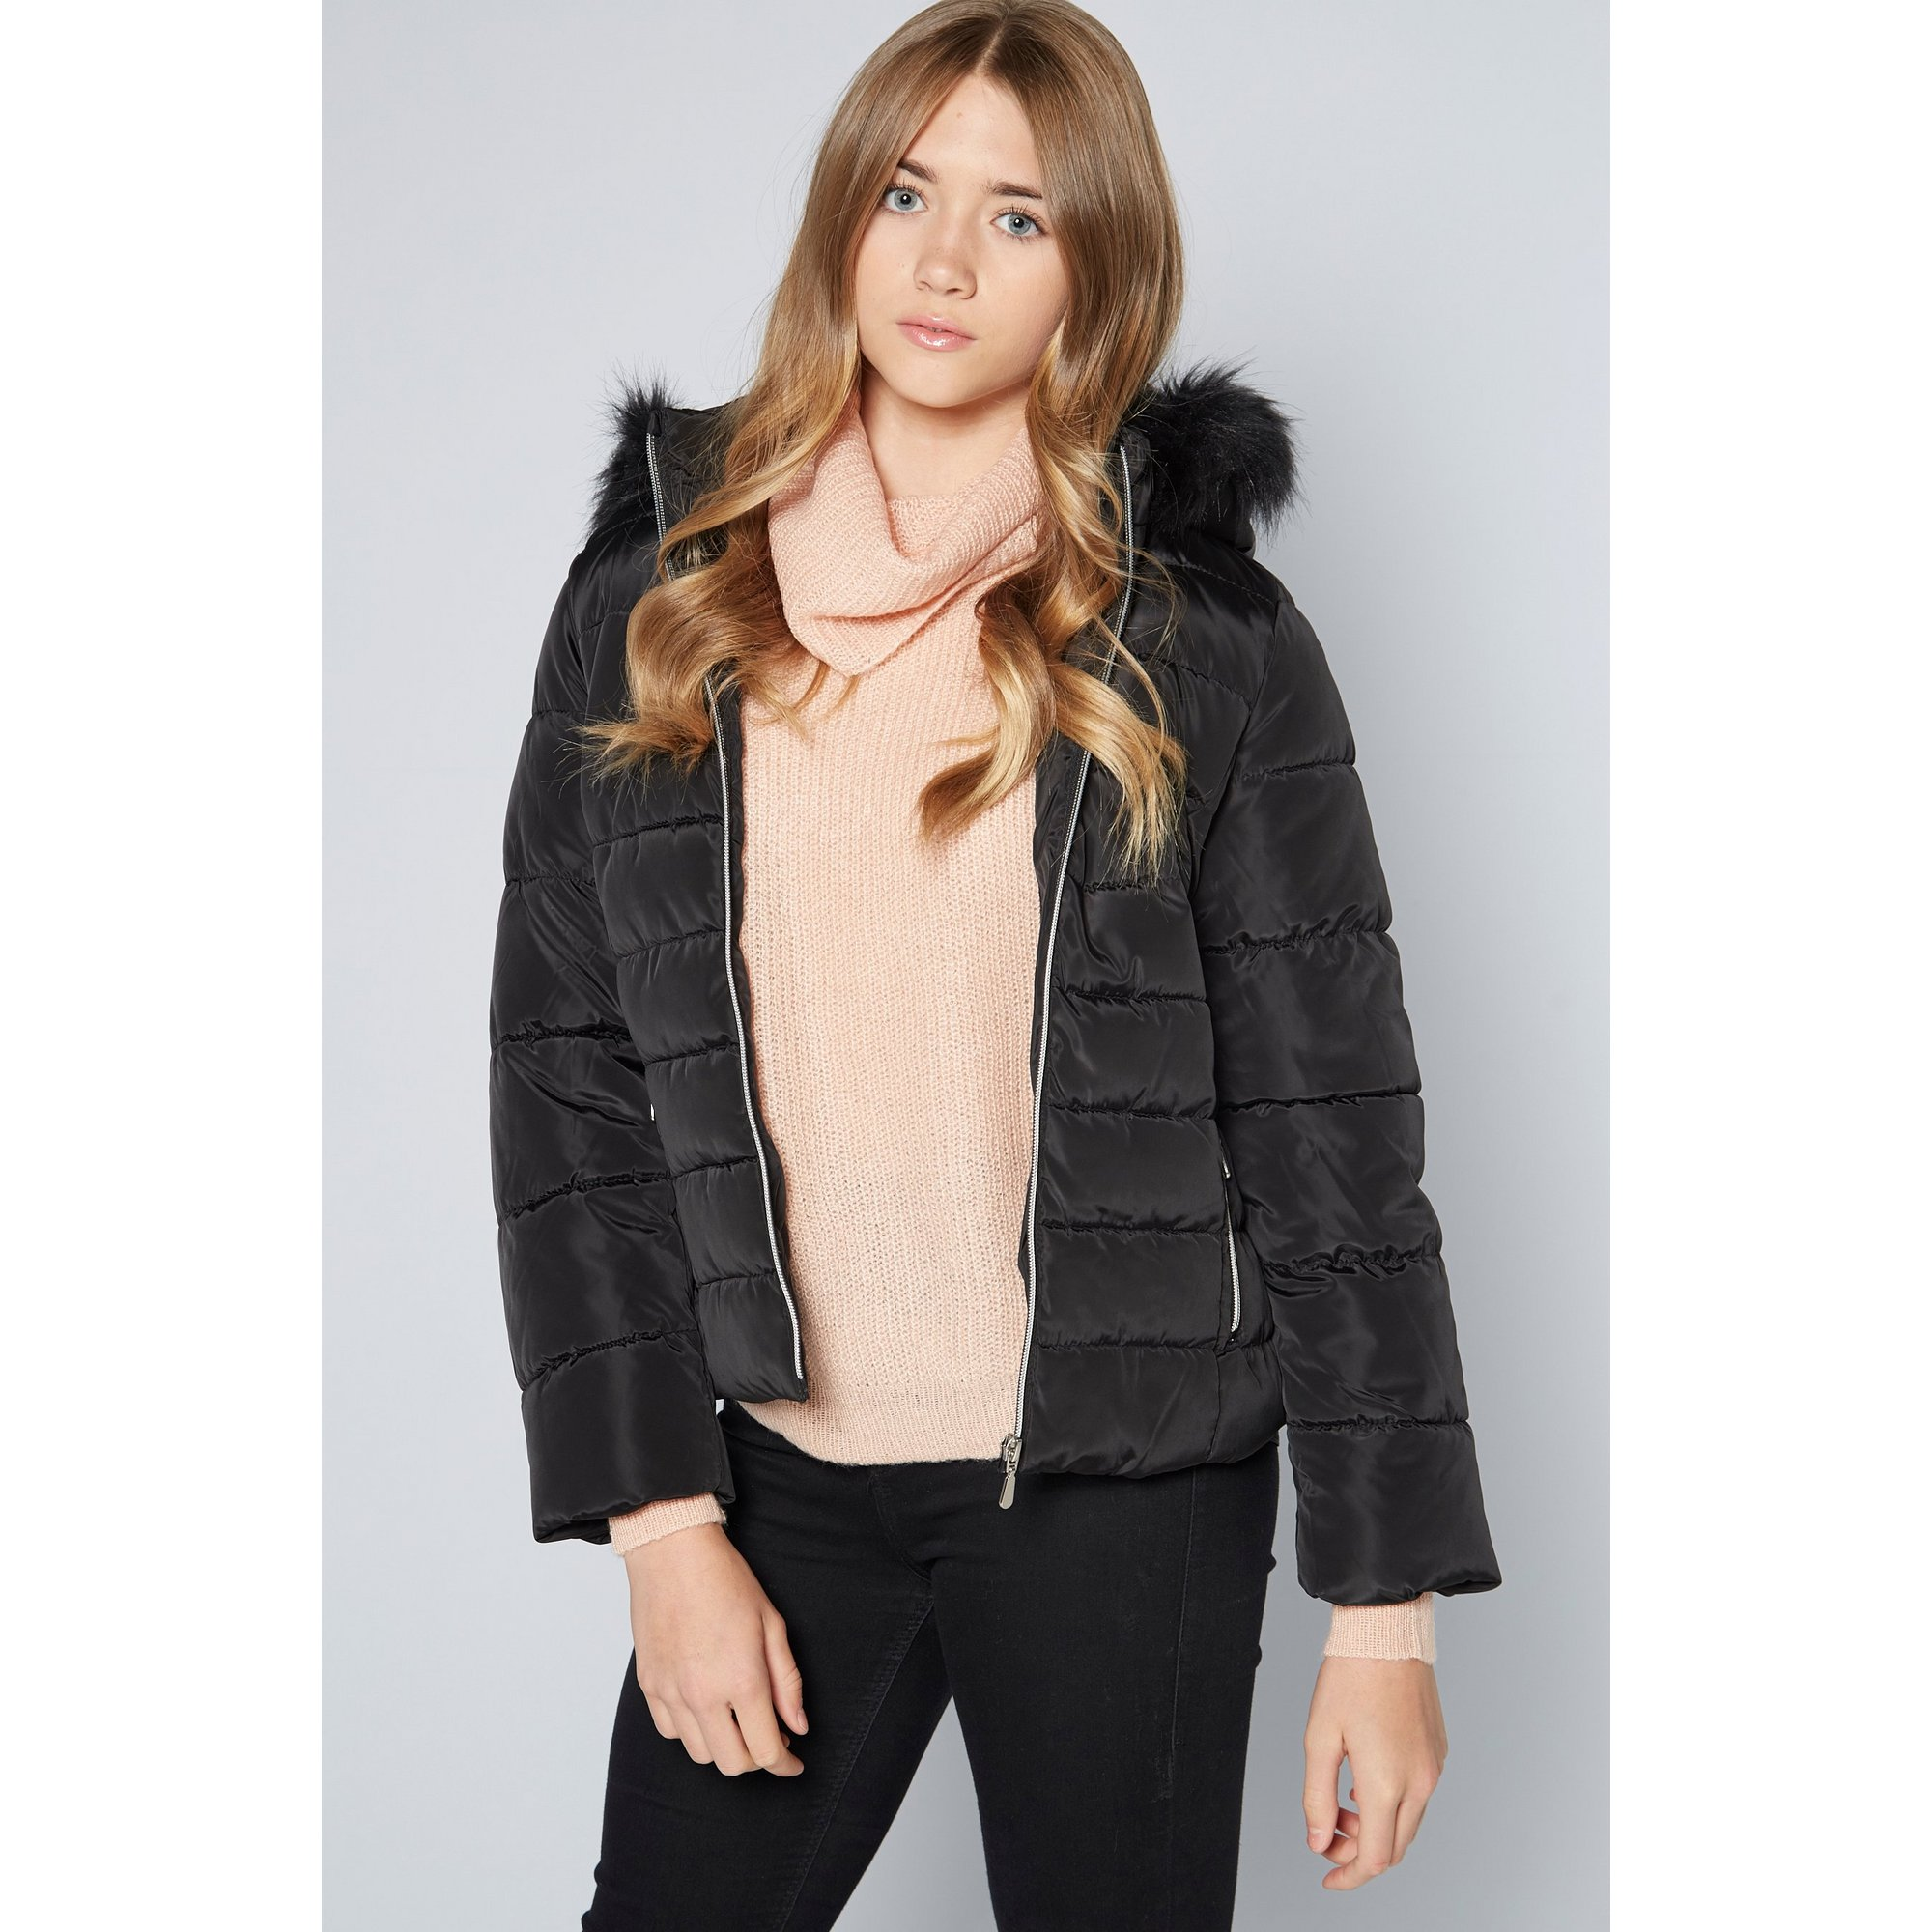 Image of Older Girls Faux Fur Hood Micro Fleece Lined Black Padded Jacket